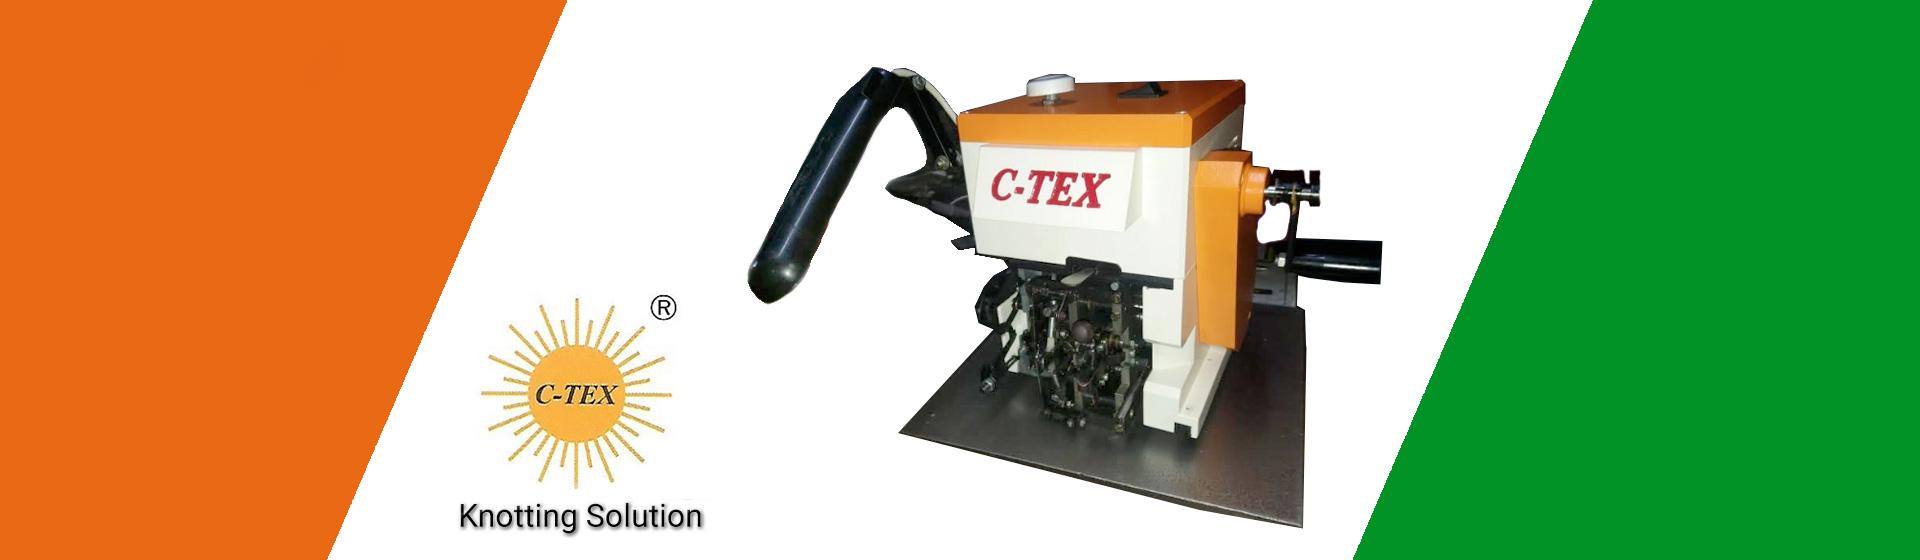 C-tex Dressing stand